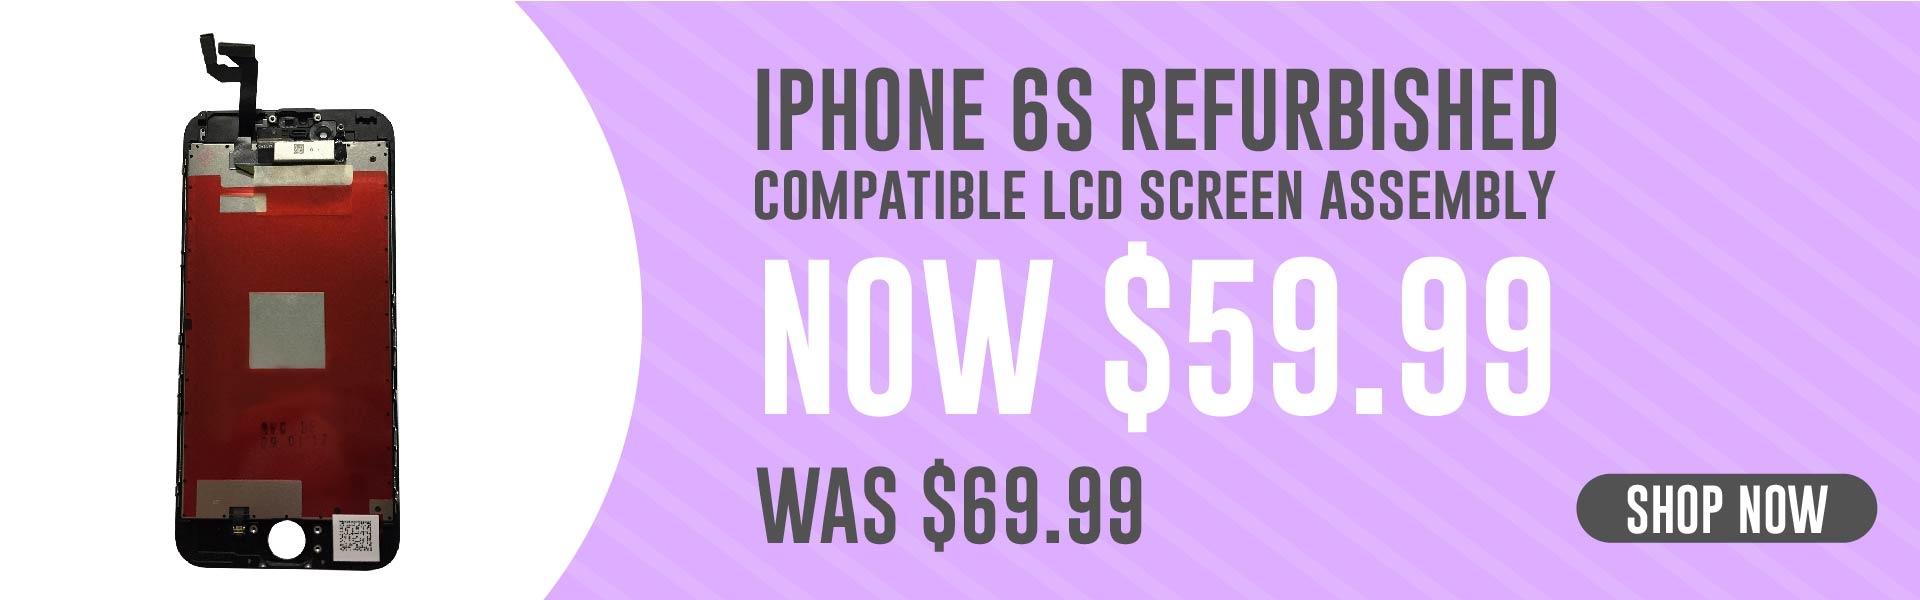 iPhone 6S Refurbished Banner